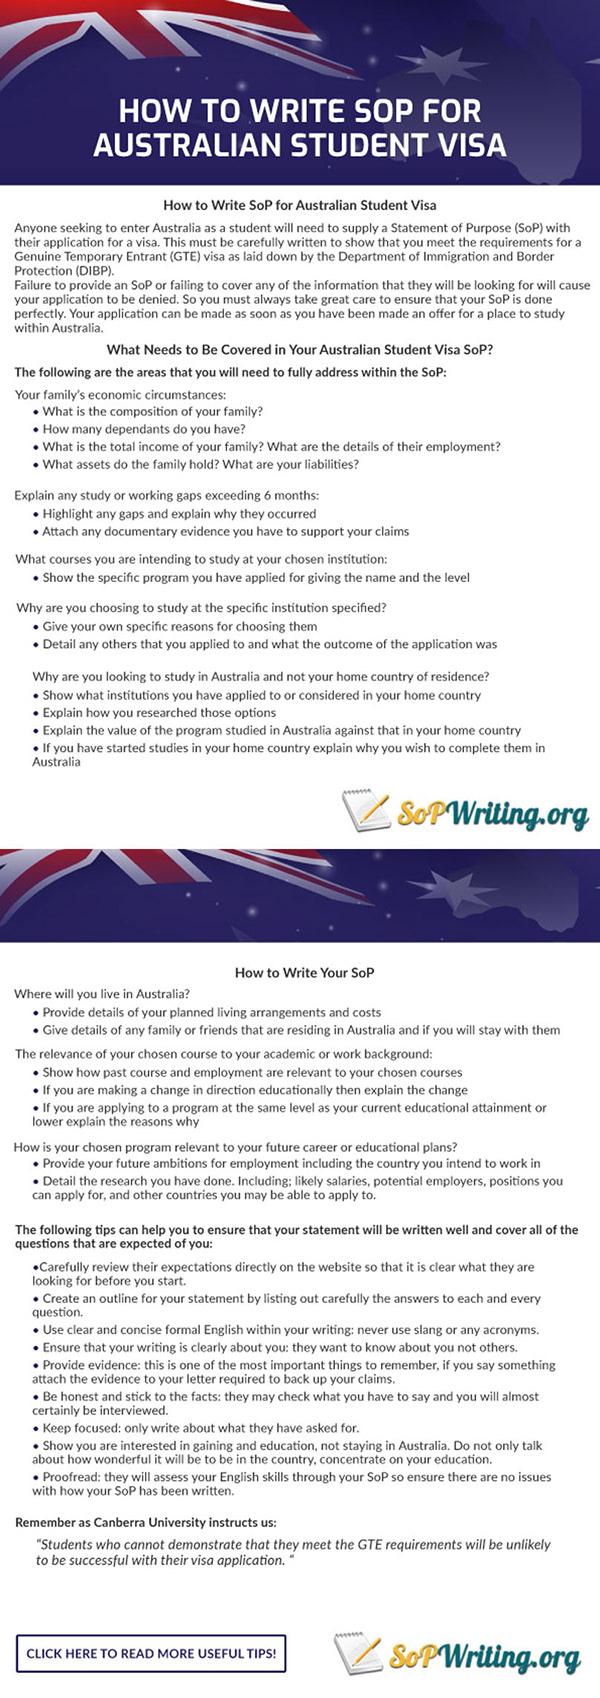 How to Write Sop for Australian Student Visa on Pantone